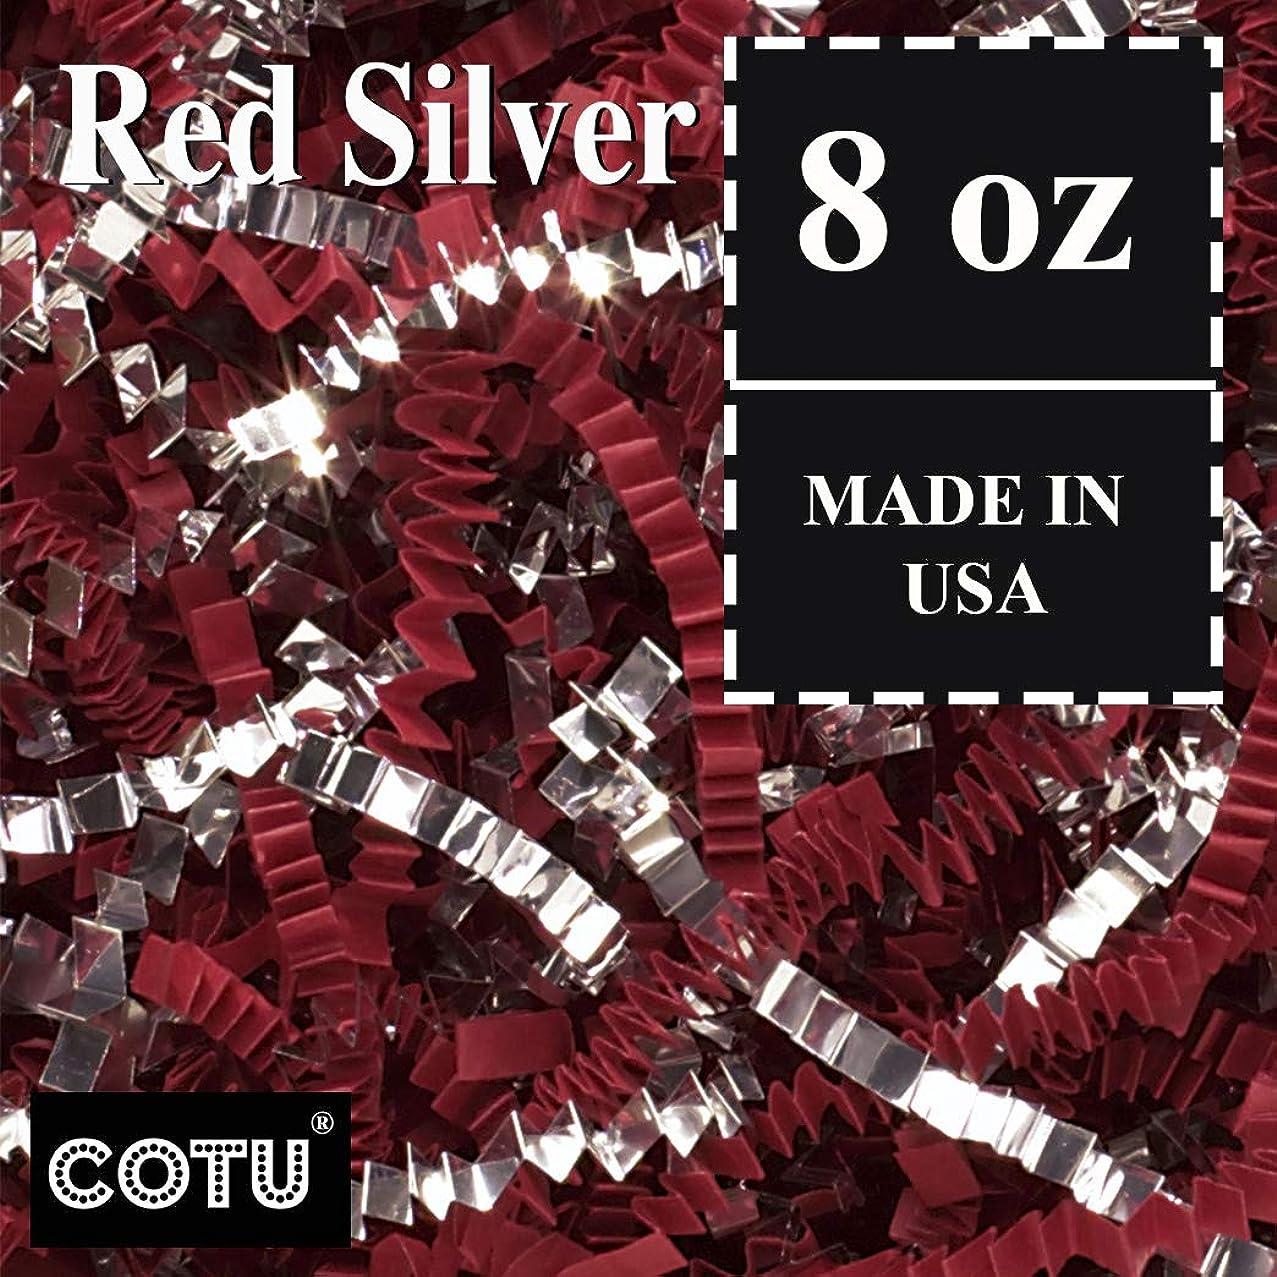 1/2 LB Premium Red Silver Metallic Mix Crinkle Shred Gift Basket Shred Crinkle Paper Filler Bedding by COTU (8 oz)